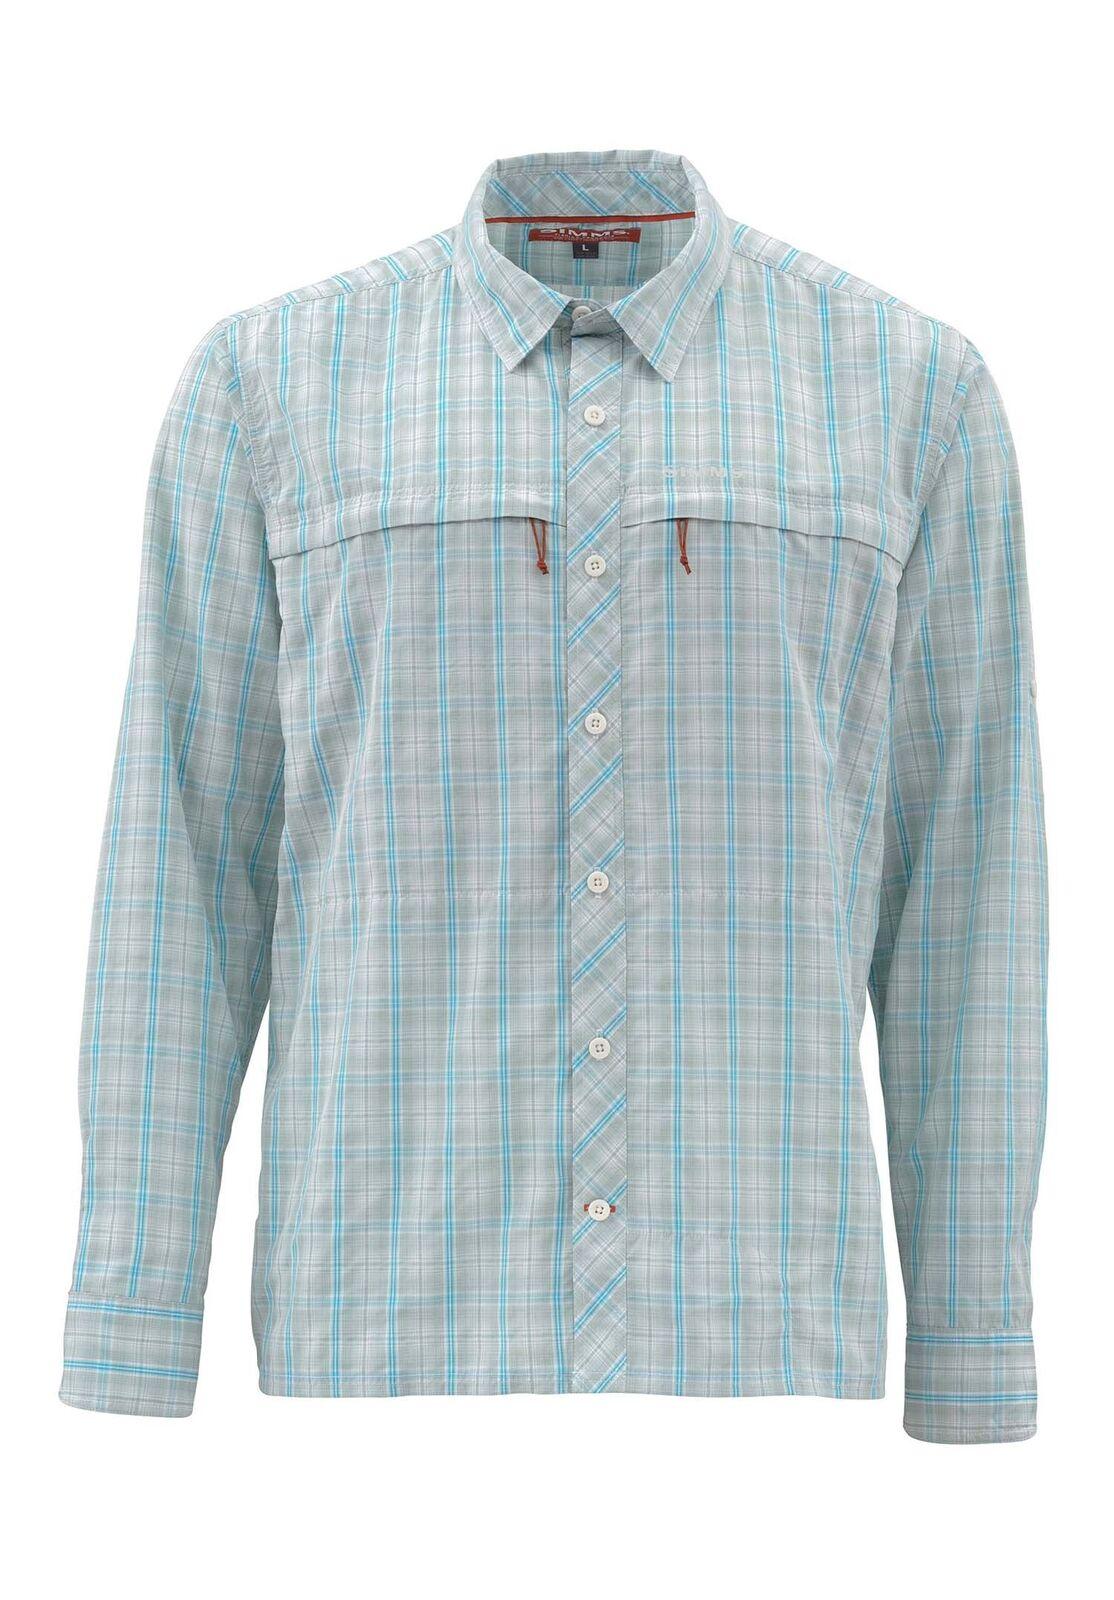 Simms Stone Cold Long Sleeve  Shirt Celadon Plaid - Size Medium -CLOSEOUT  cheap online